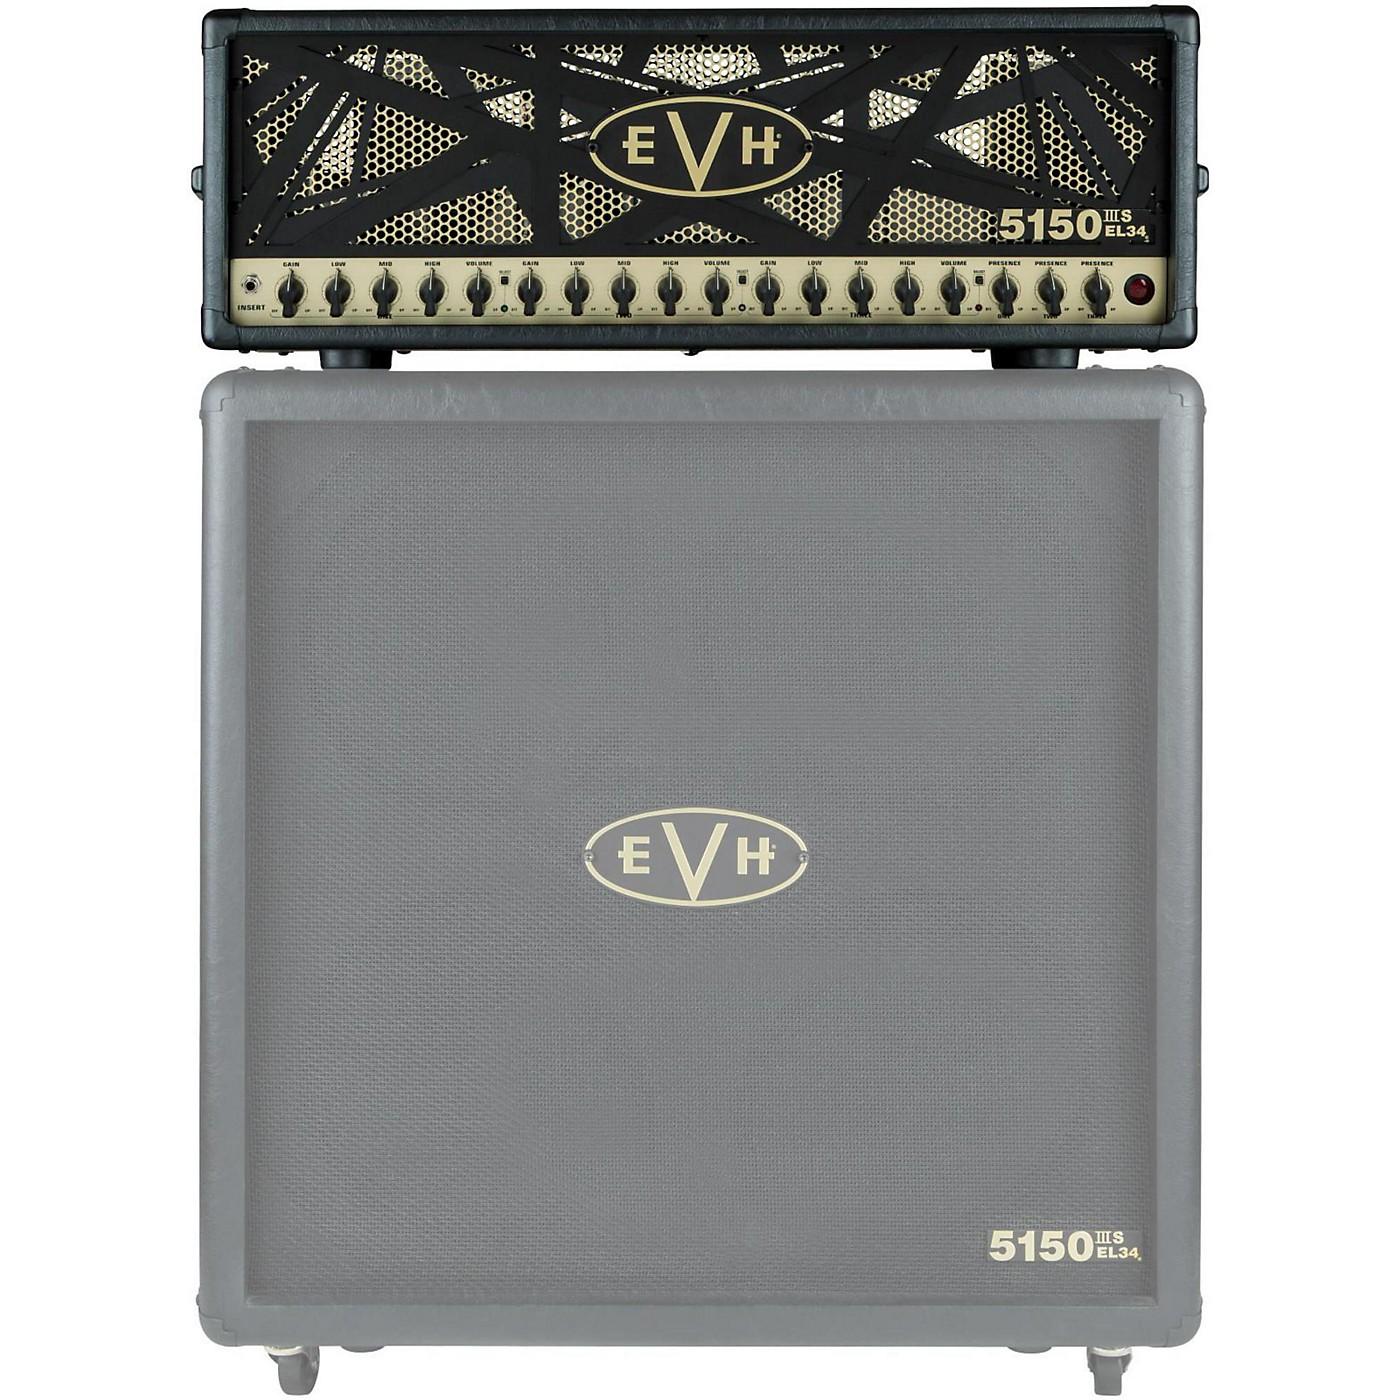 EVH 5150IIIS 100S EL34 100W Tube Guitar Head thumbnail